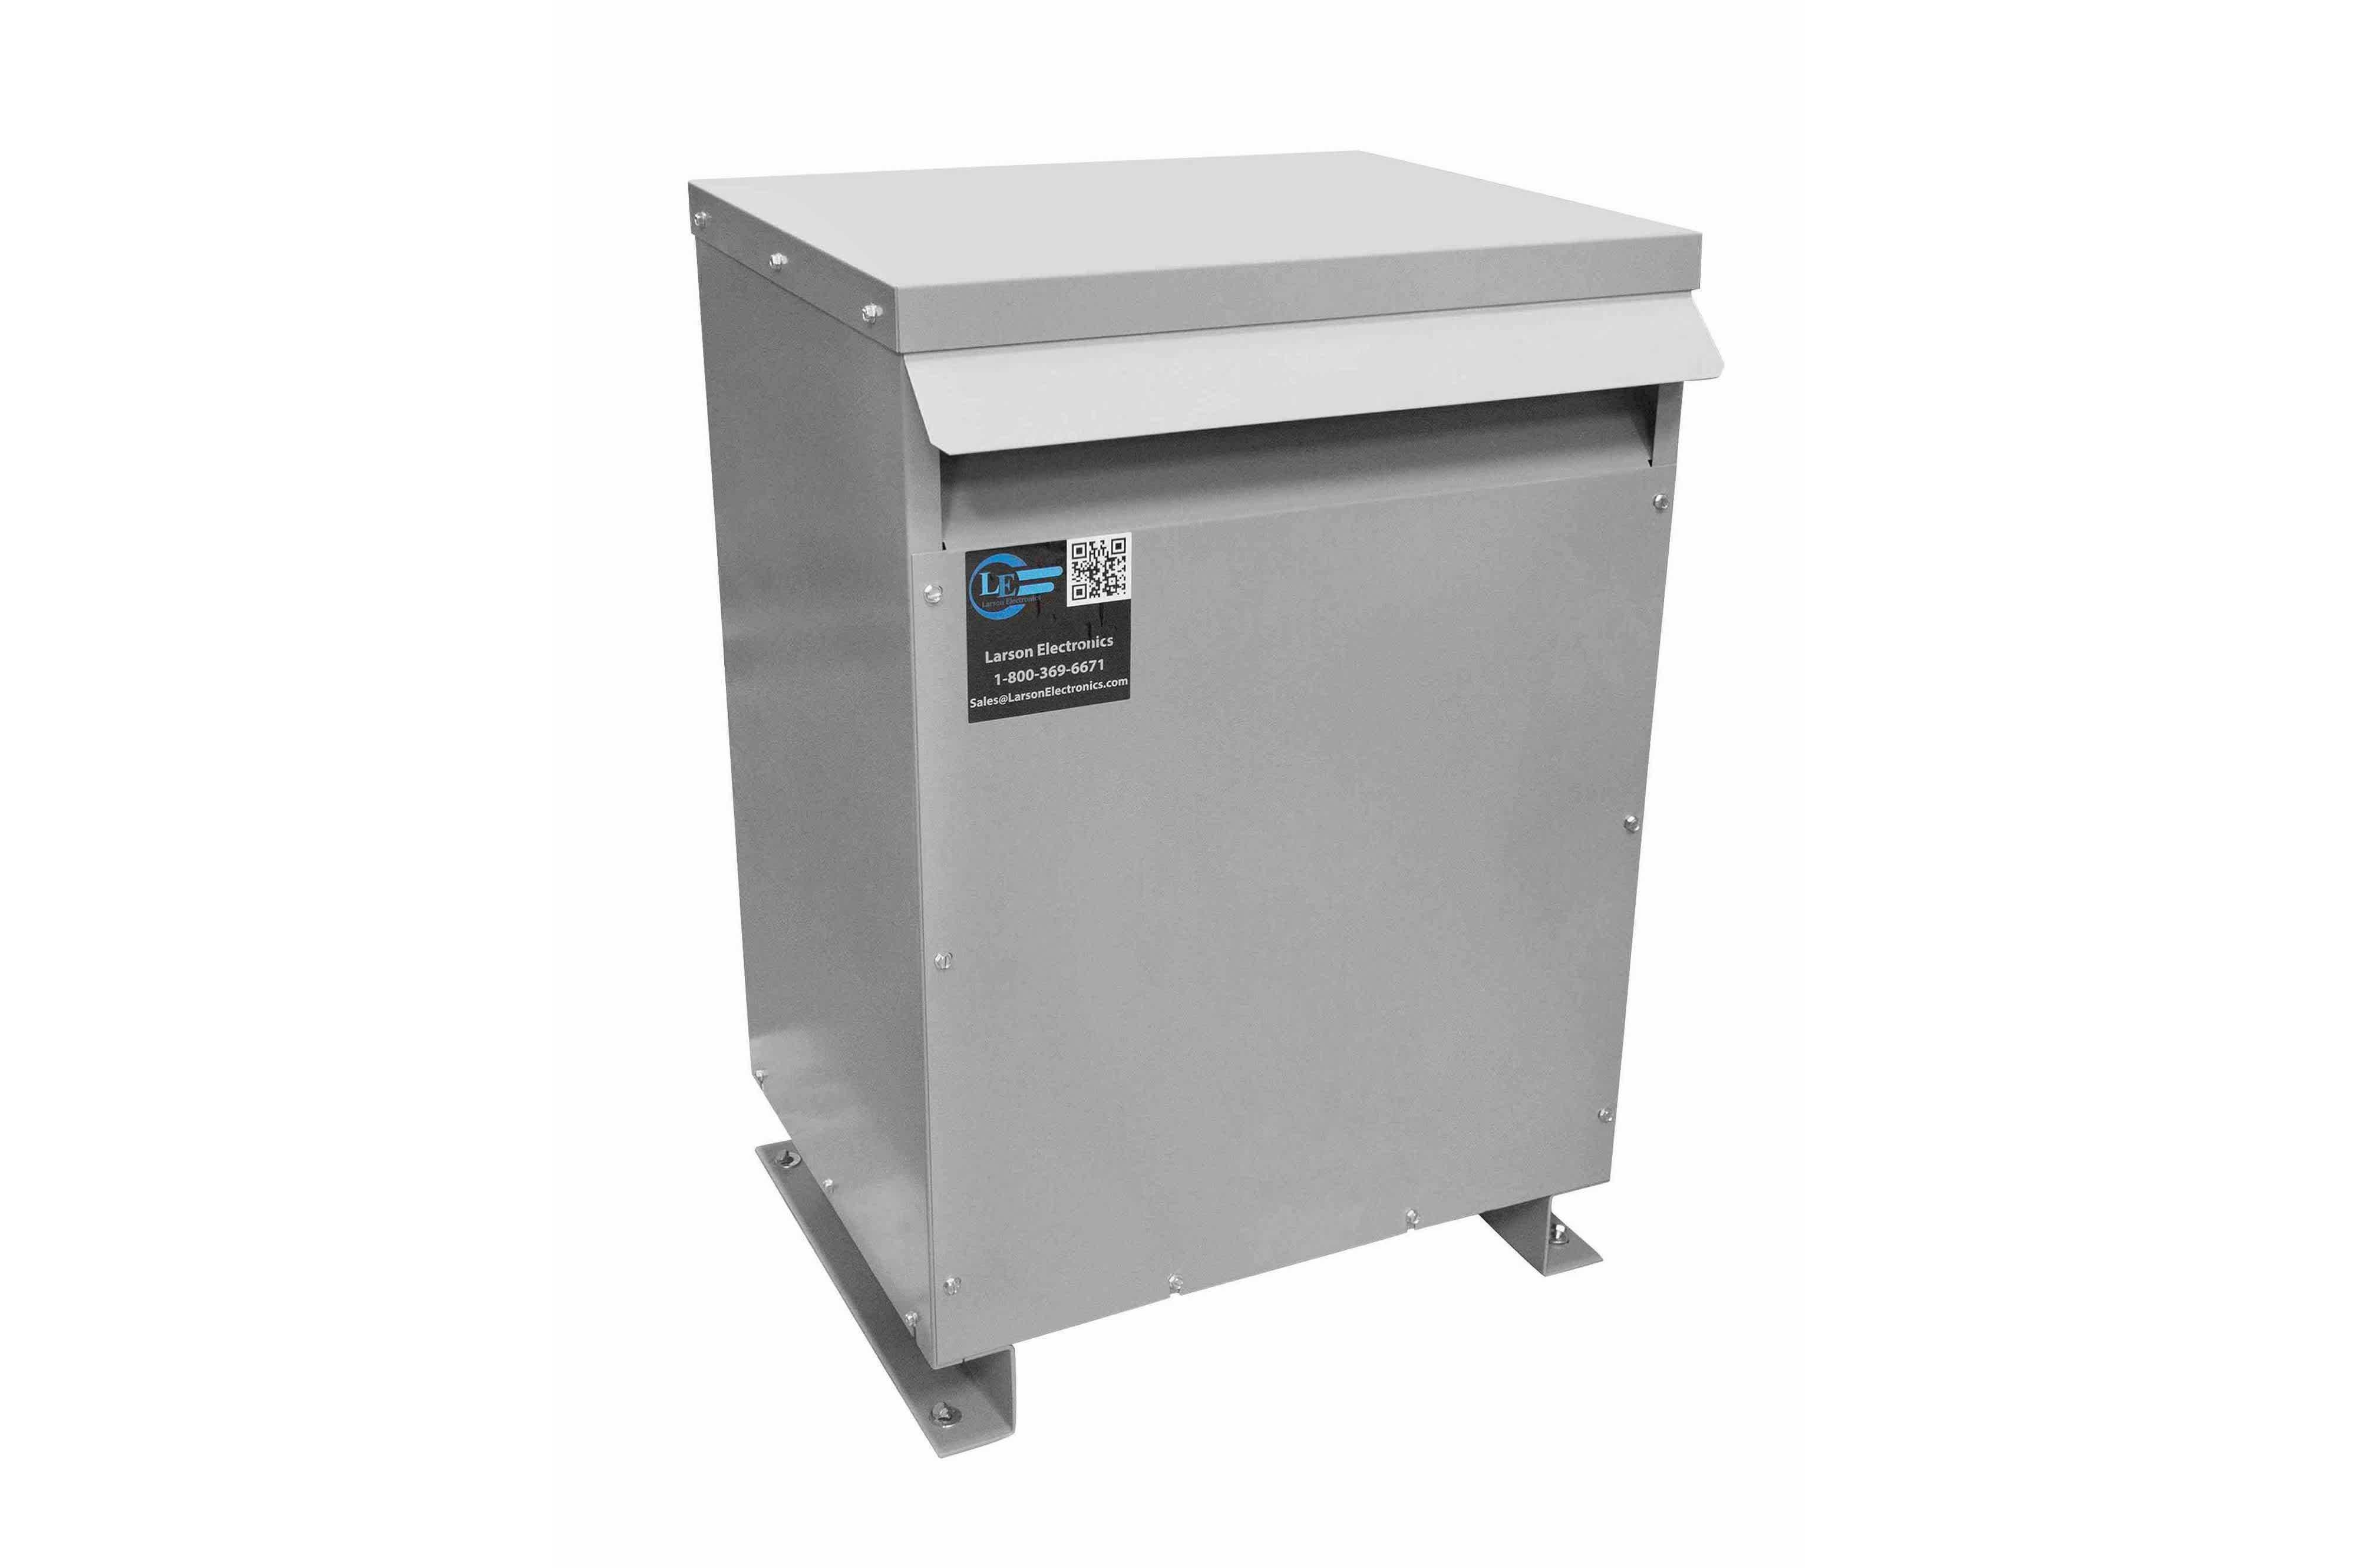 250 kVA 3PH Isolation Transformer, 480V Wye Primary, 415Y/240 Wye-N Secondary, N3R, Ventilated, 60 Hz